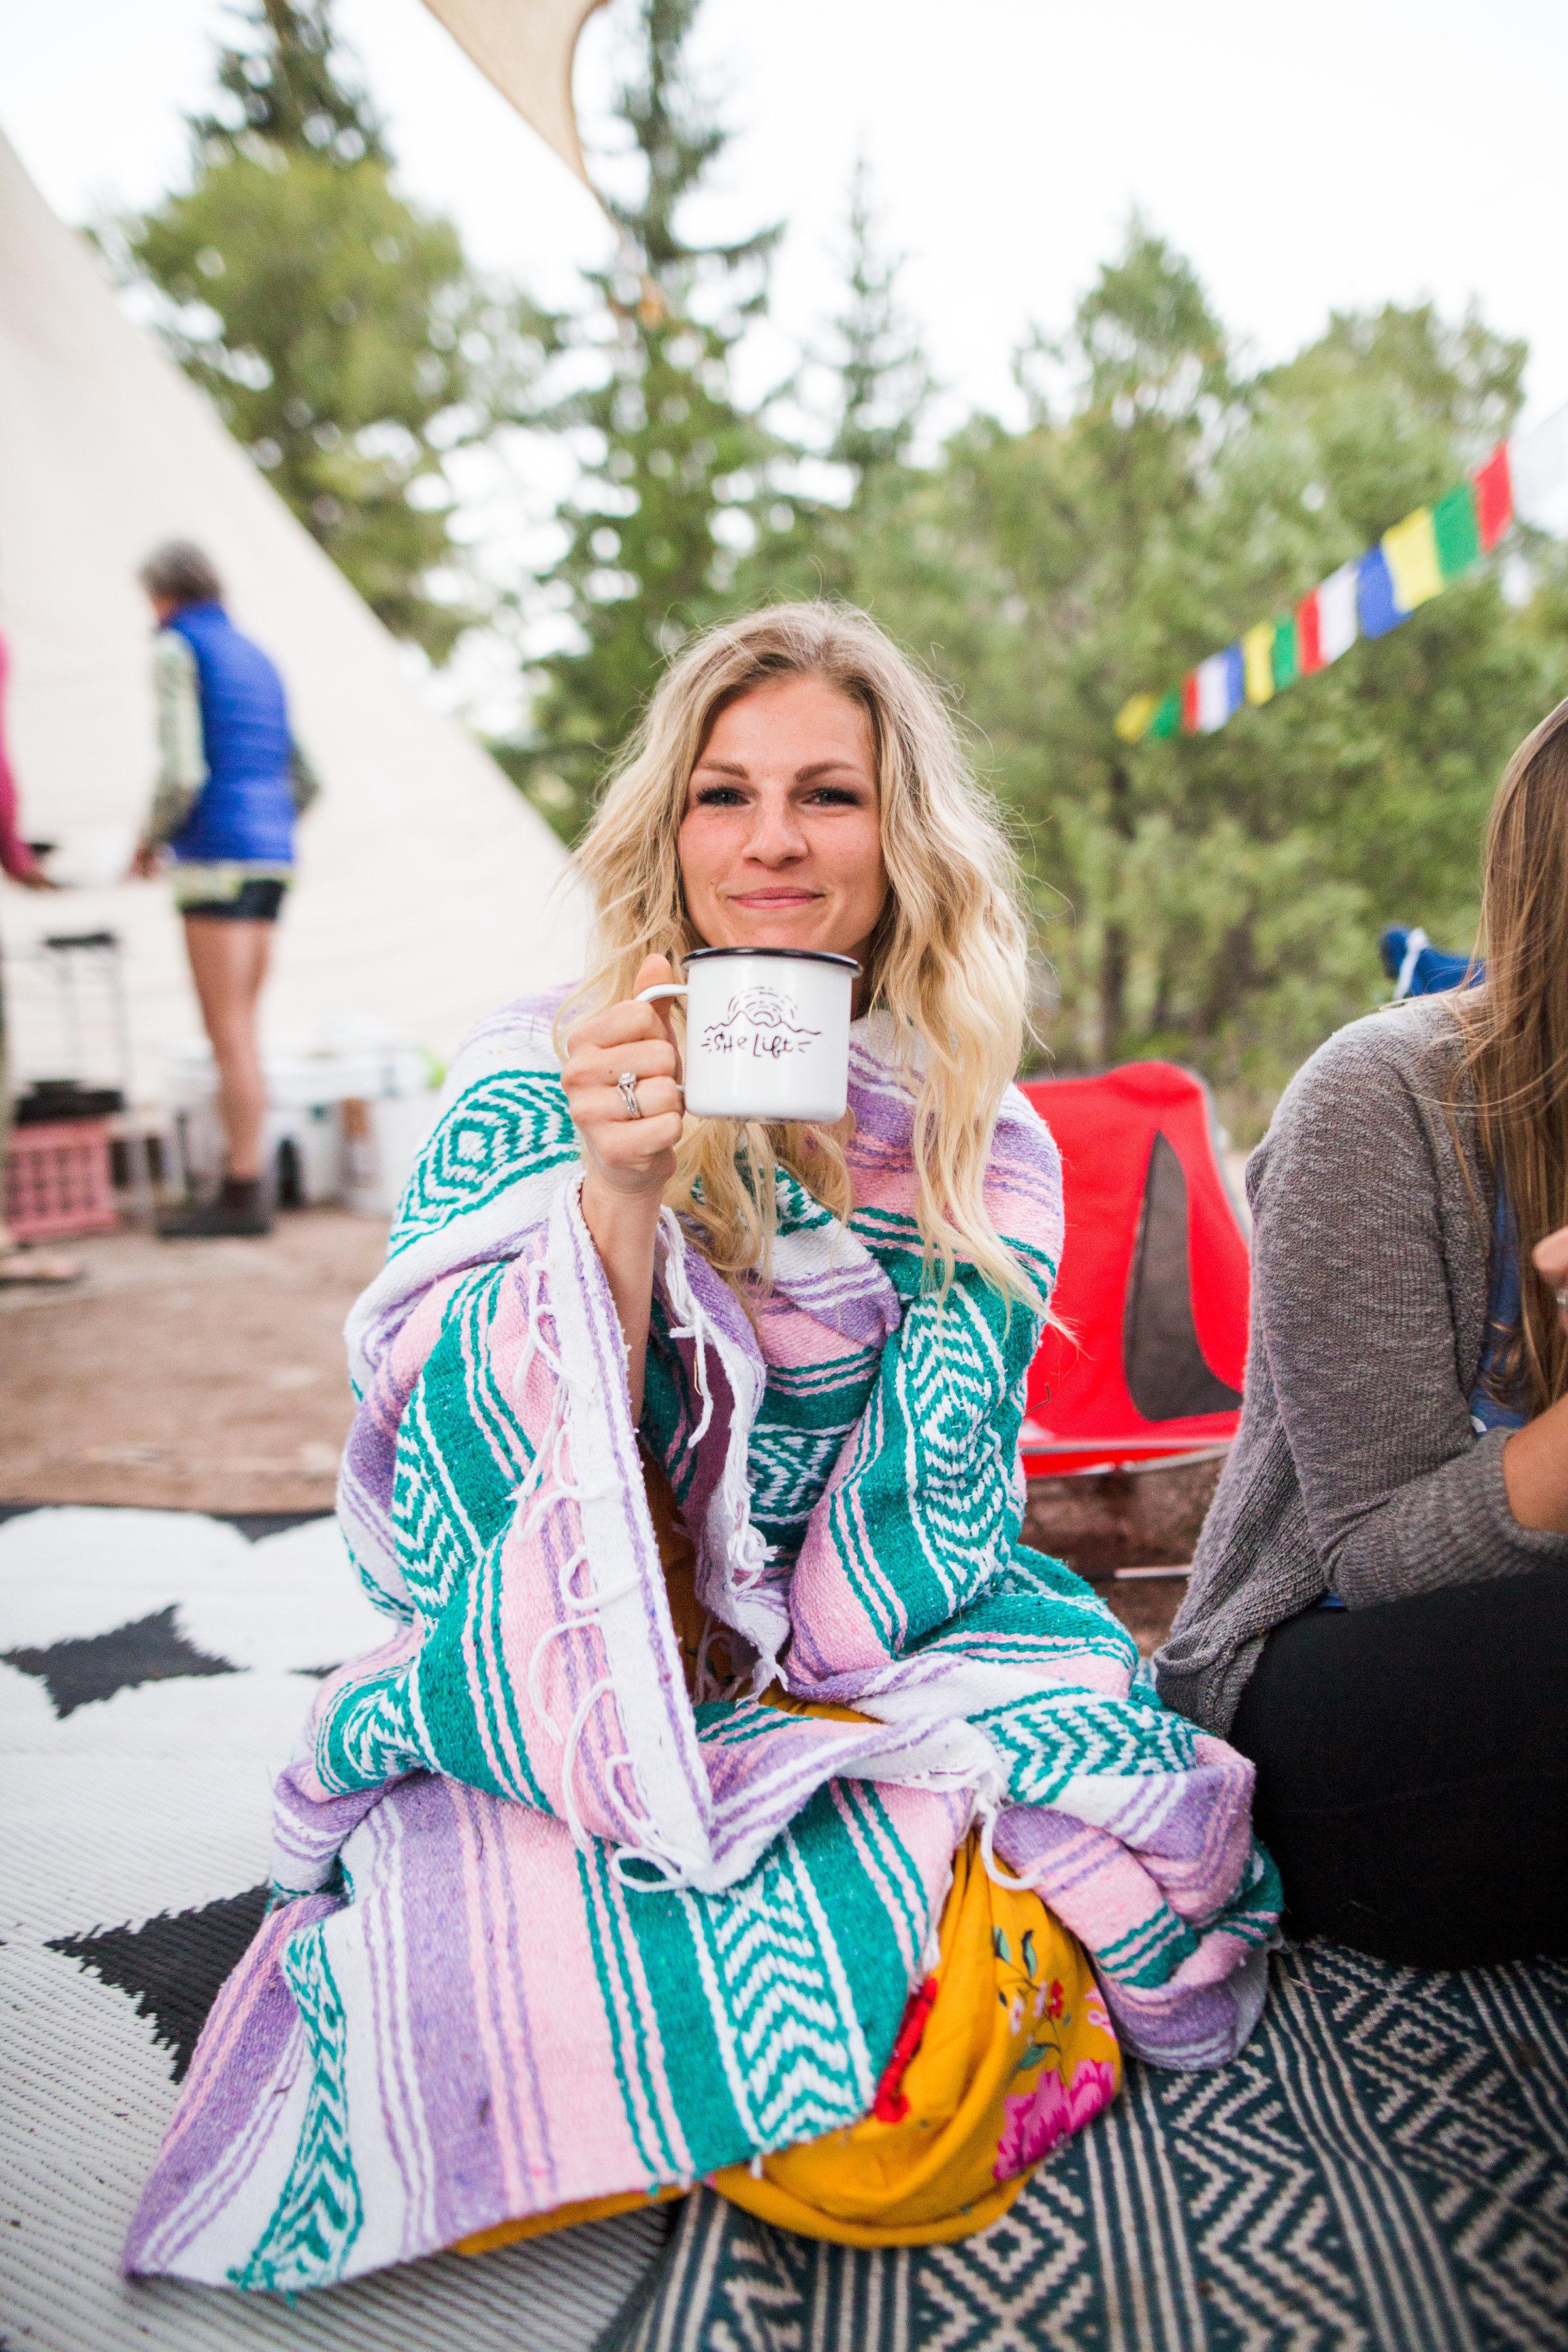 0818-Shelift-Colorado-Camping-Last-Night-2.JPG